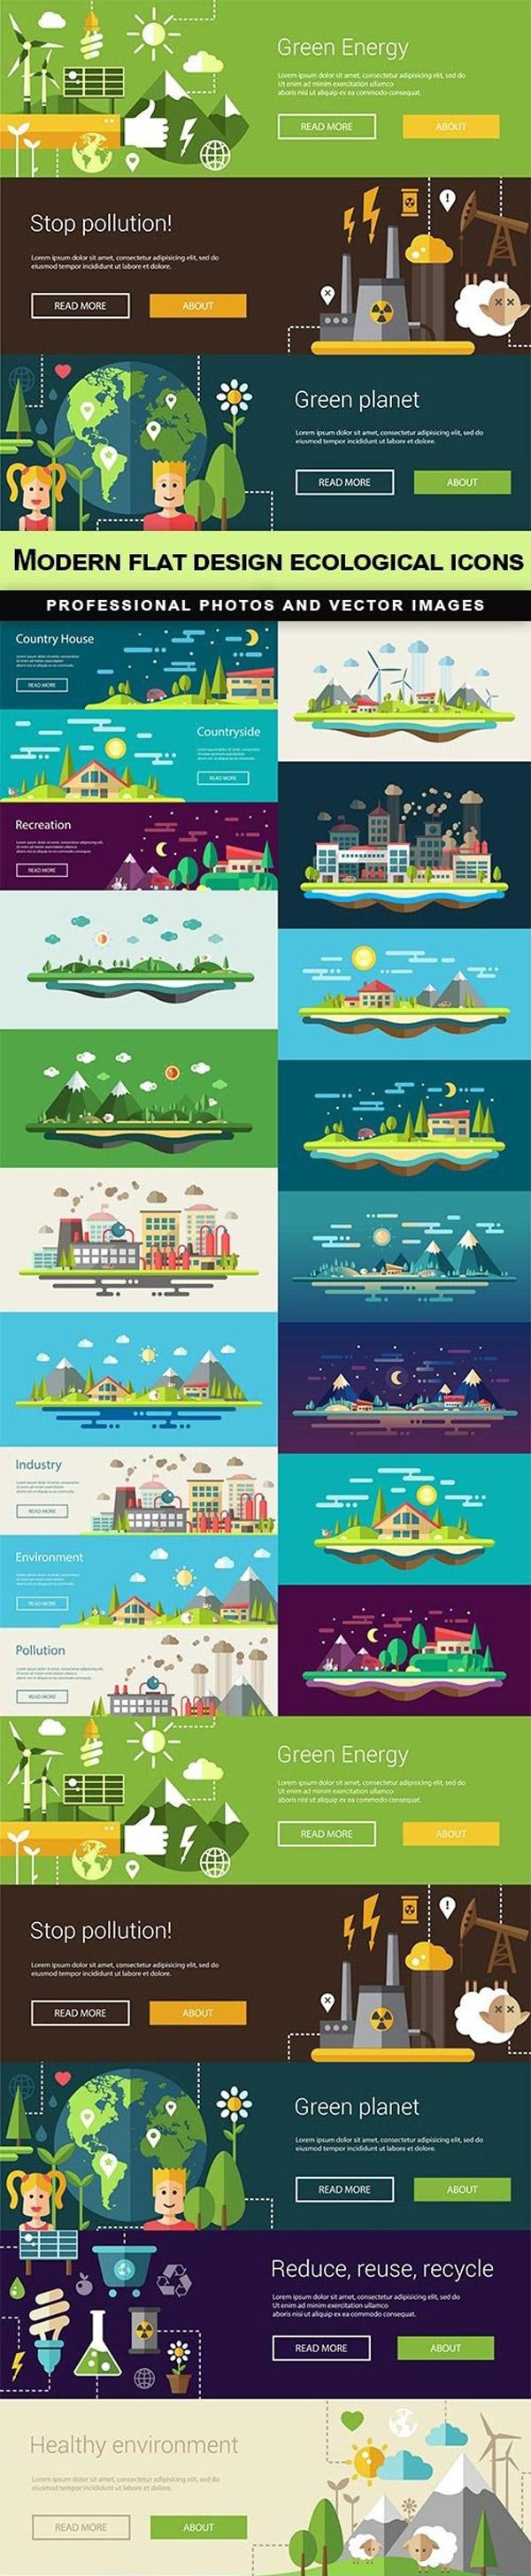 Flat eco-illustrations vector